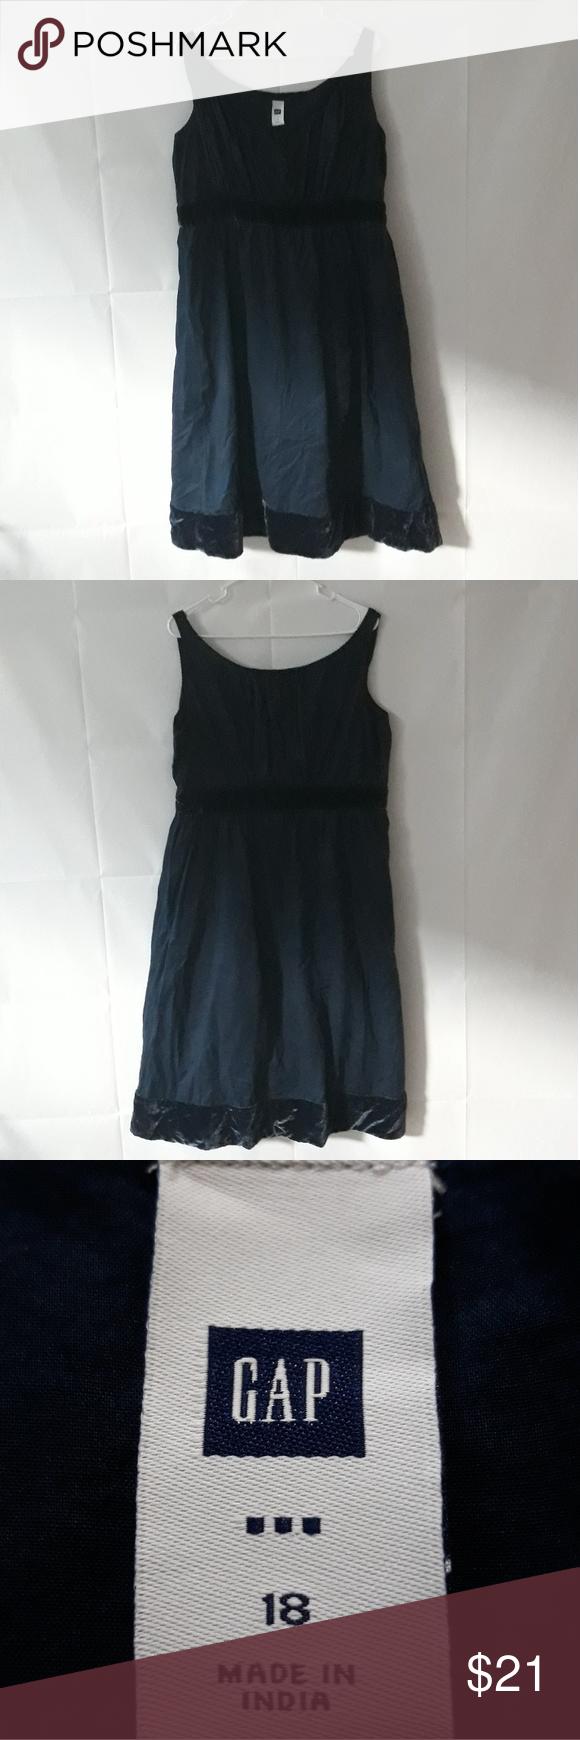 Gap Summer Dress Size 18 Navrly Blue Ab68c Size 18 Dress Summer Dresses Gap Dress [ 1740 x 580 Pixel ]